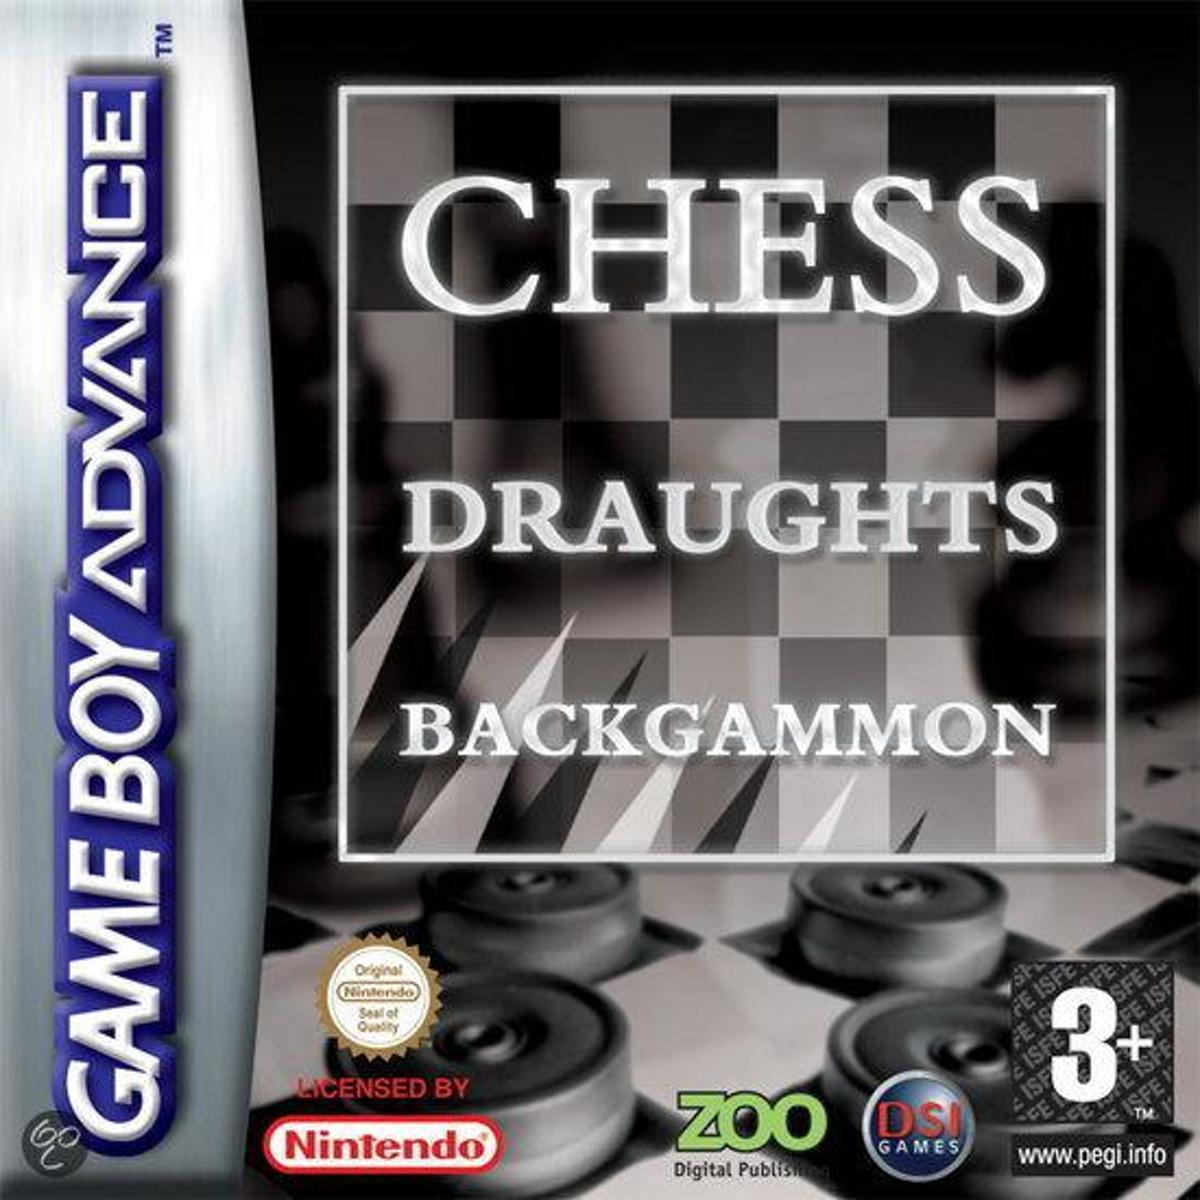 Backgammon / Chess / Draughts